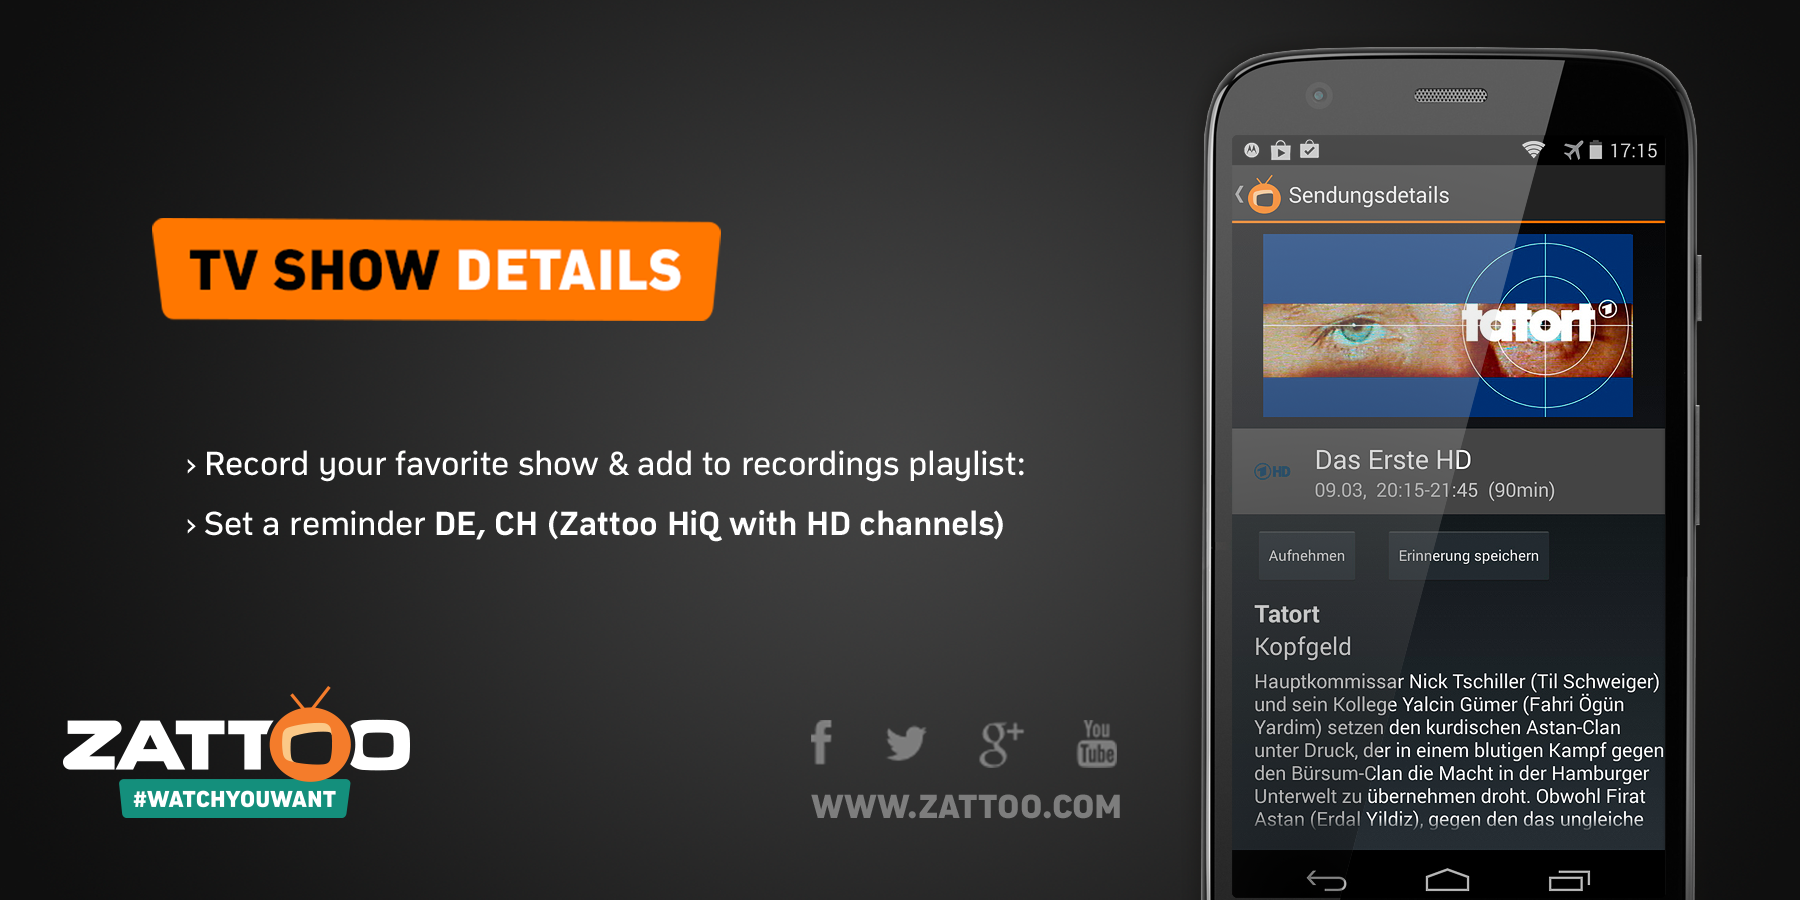 pro7 tv app